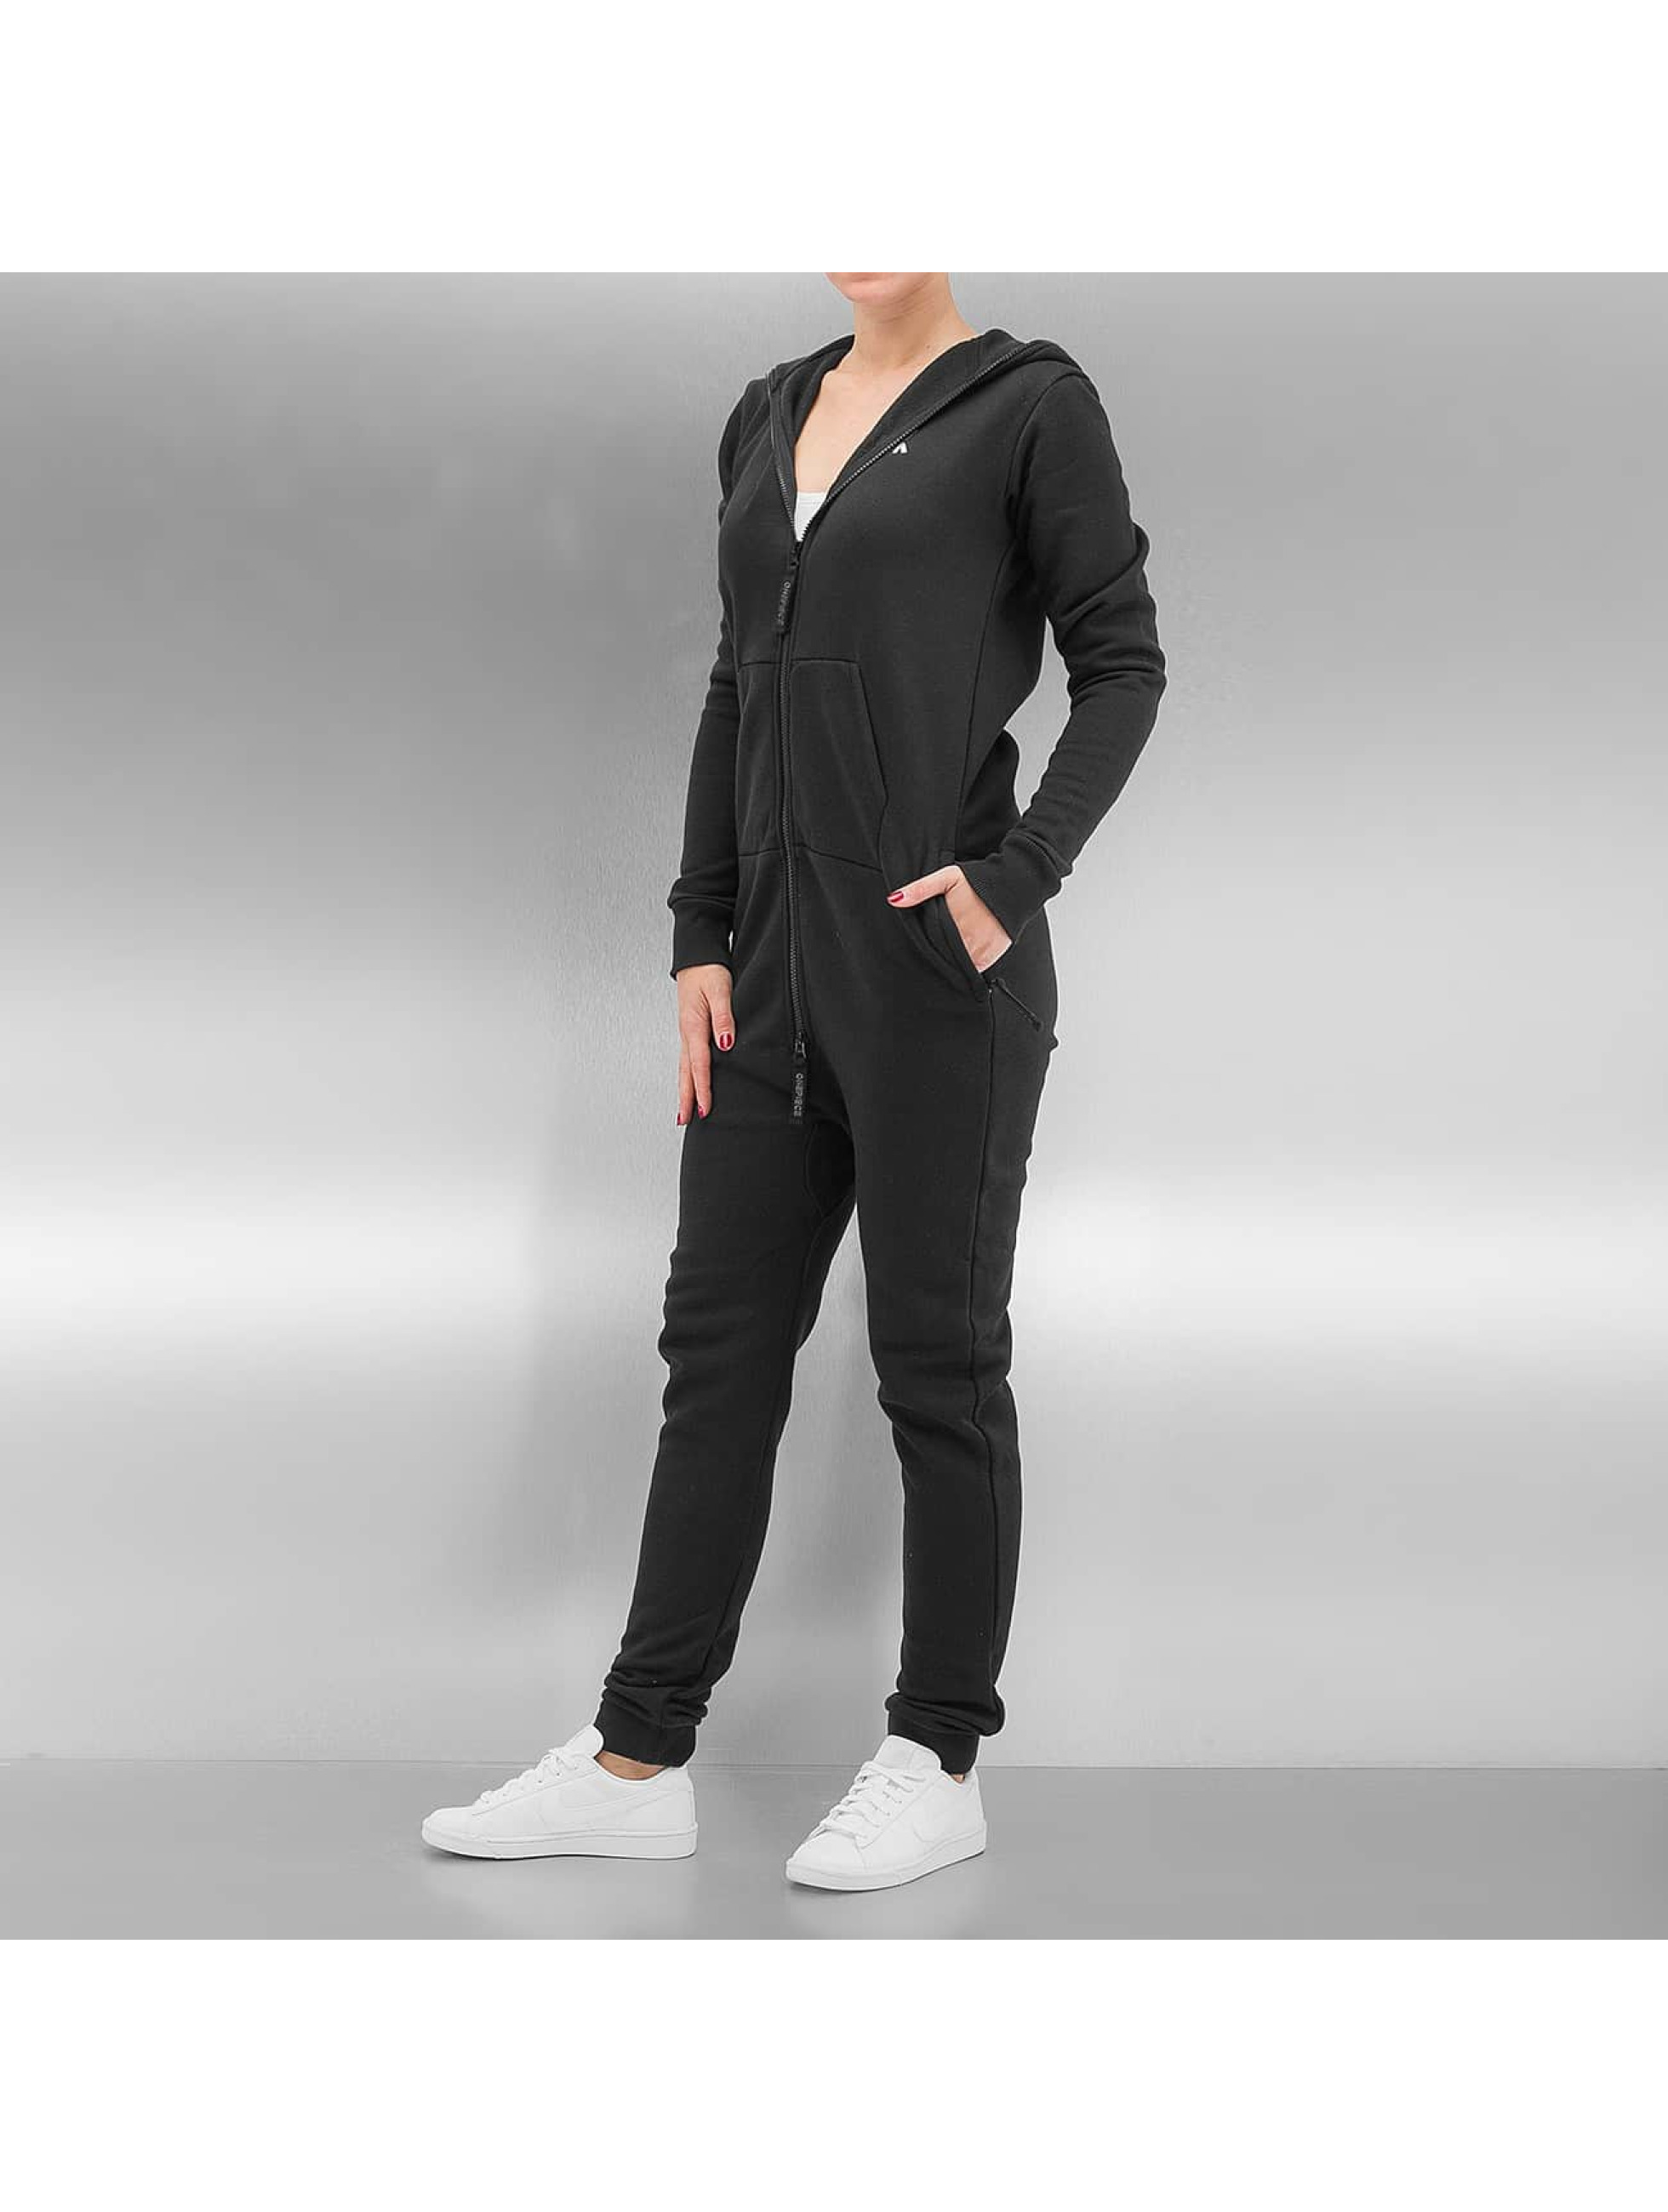 onepiece original onesie 2 0 noir combinaison combishort 331822. Black Bedroom Furniture Sets. Home Design Ideas